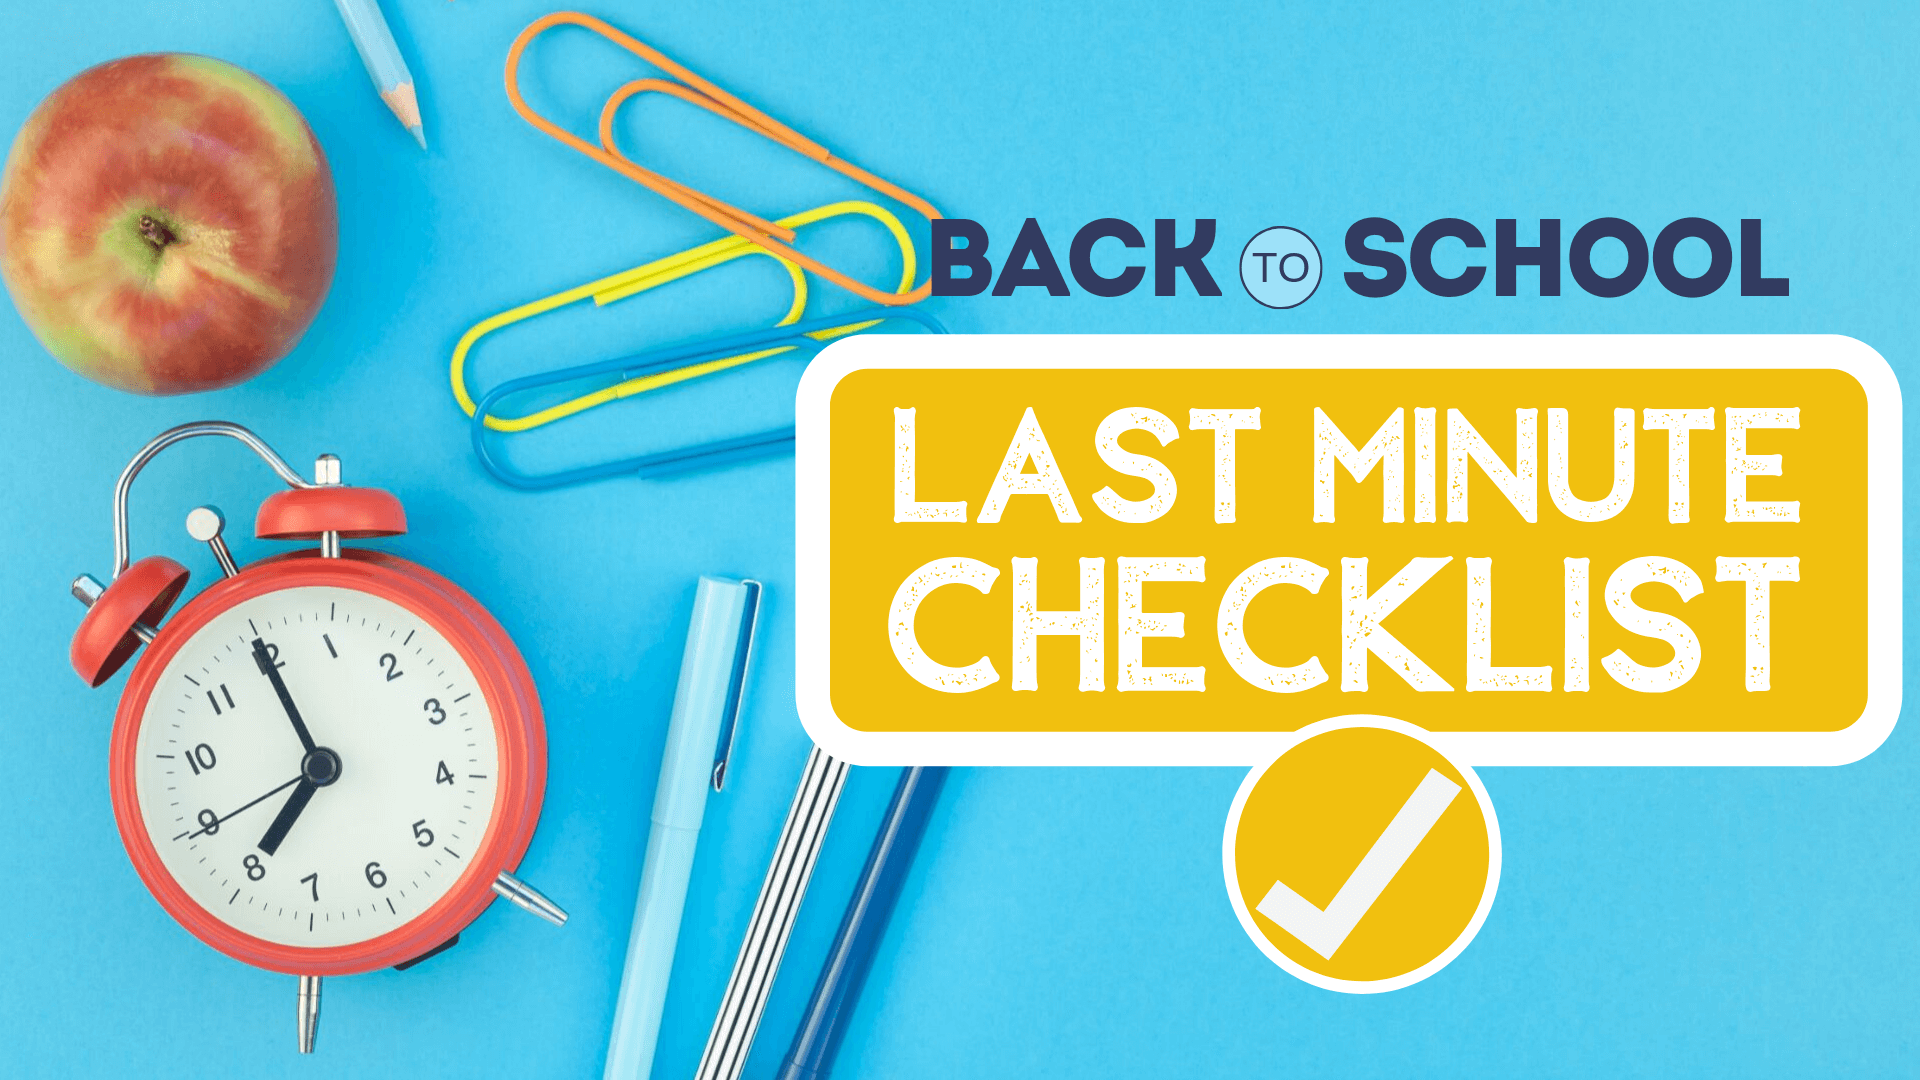 Last minute checklist header